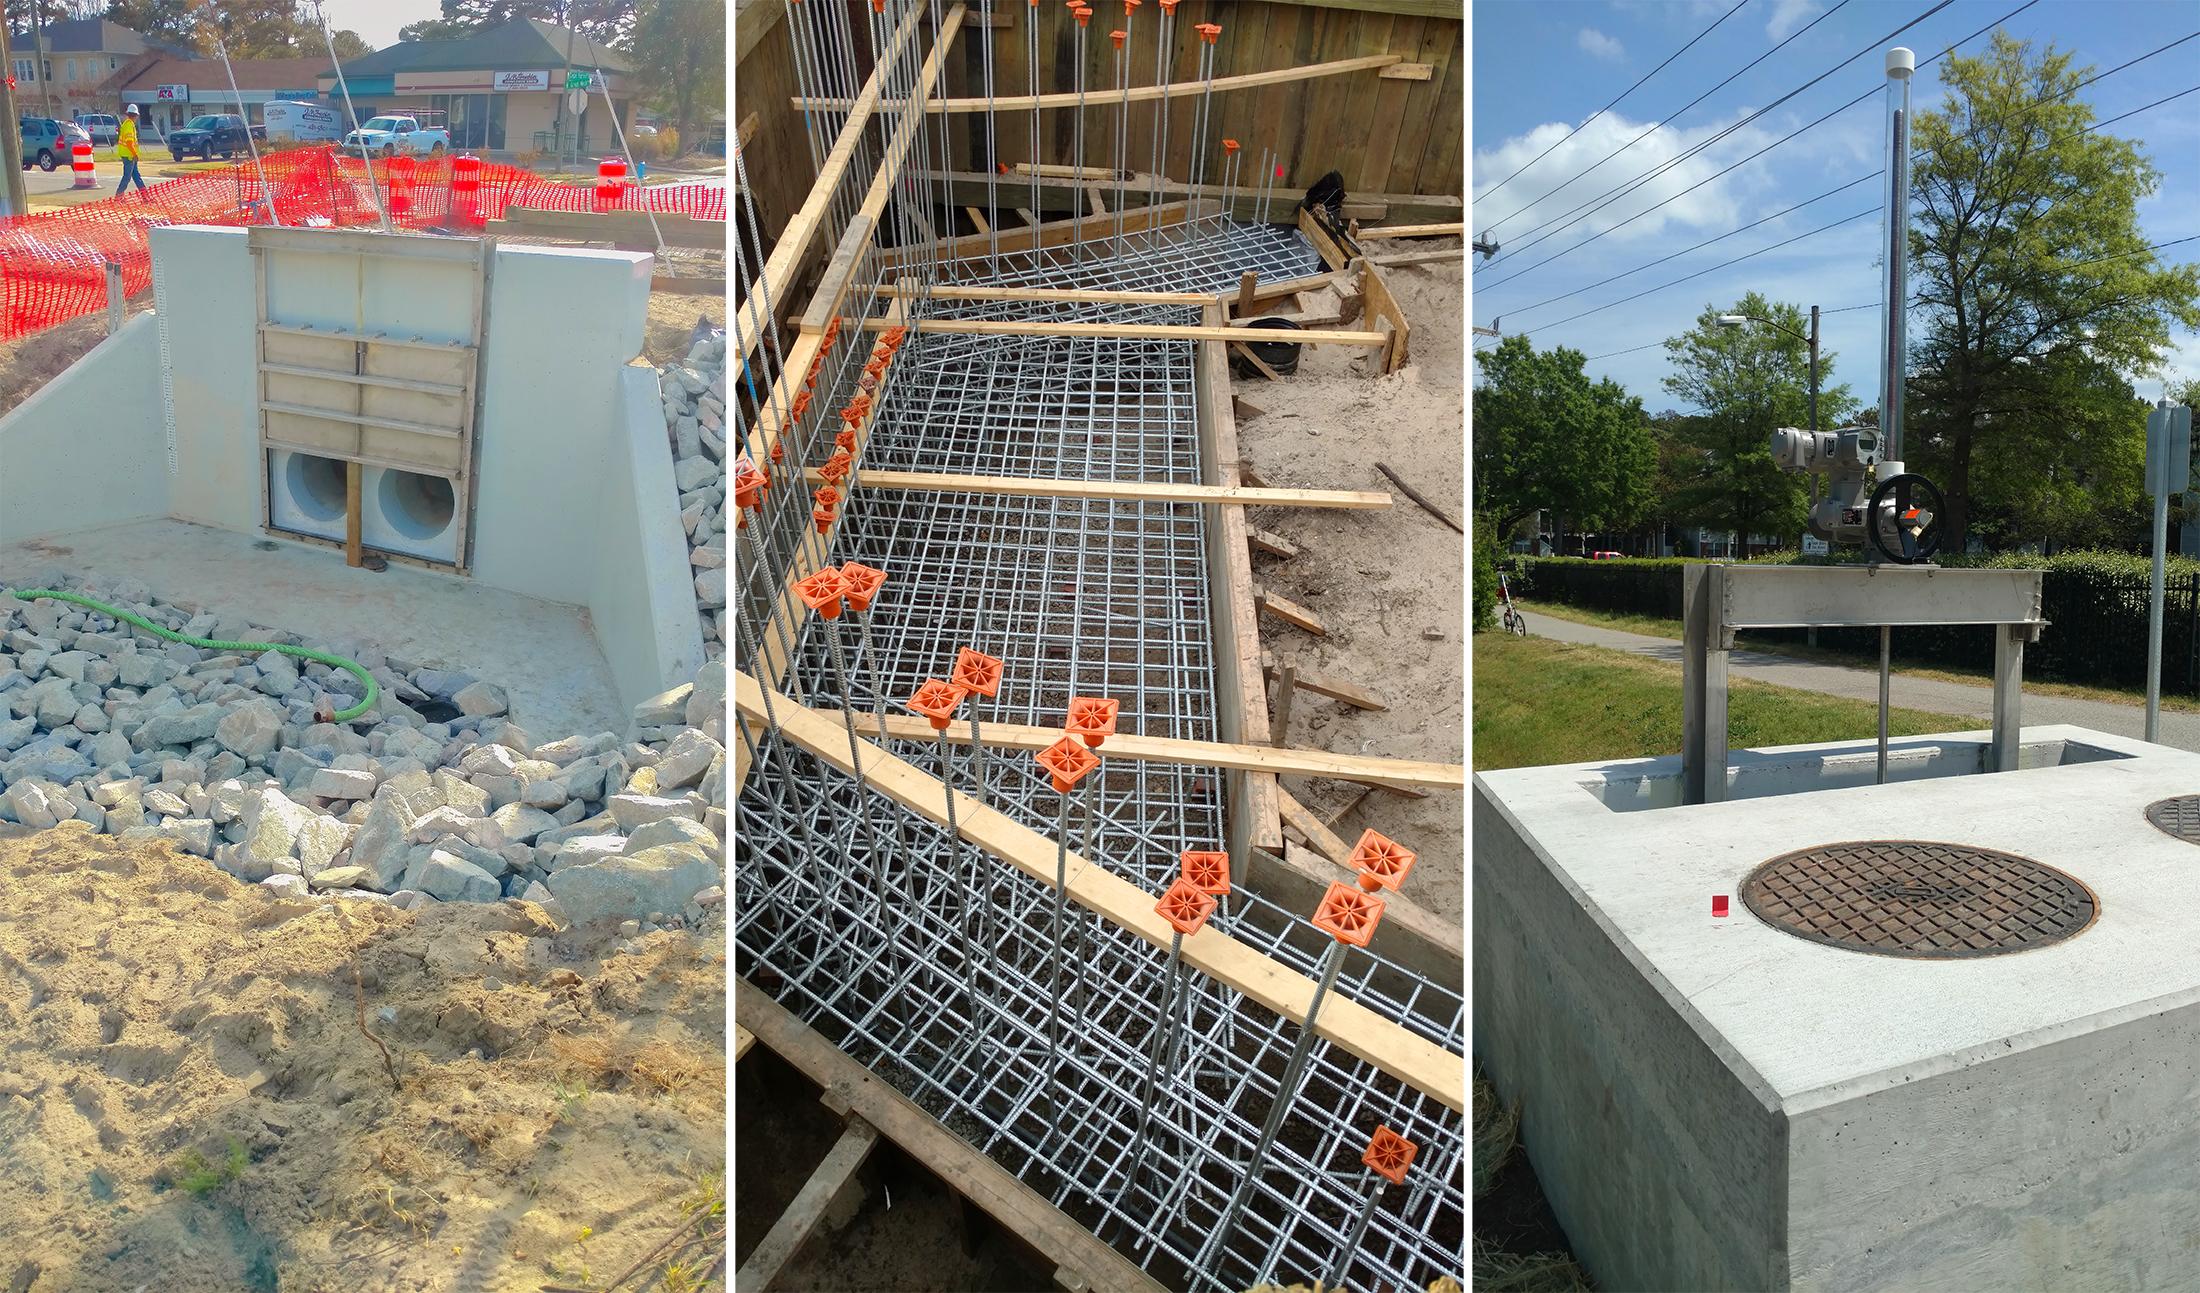 CAPE HENRY SLUICE GATE CONSTRUCTION, VIRGINIA BEACH